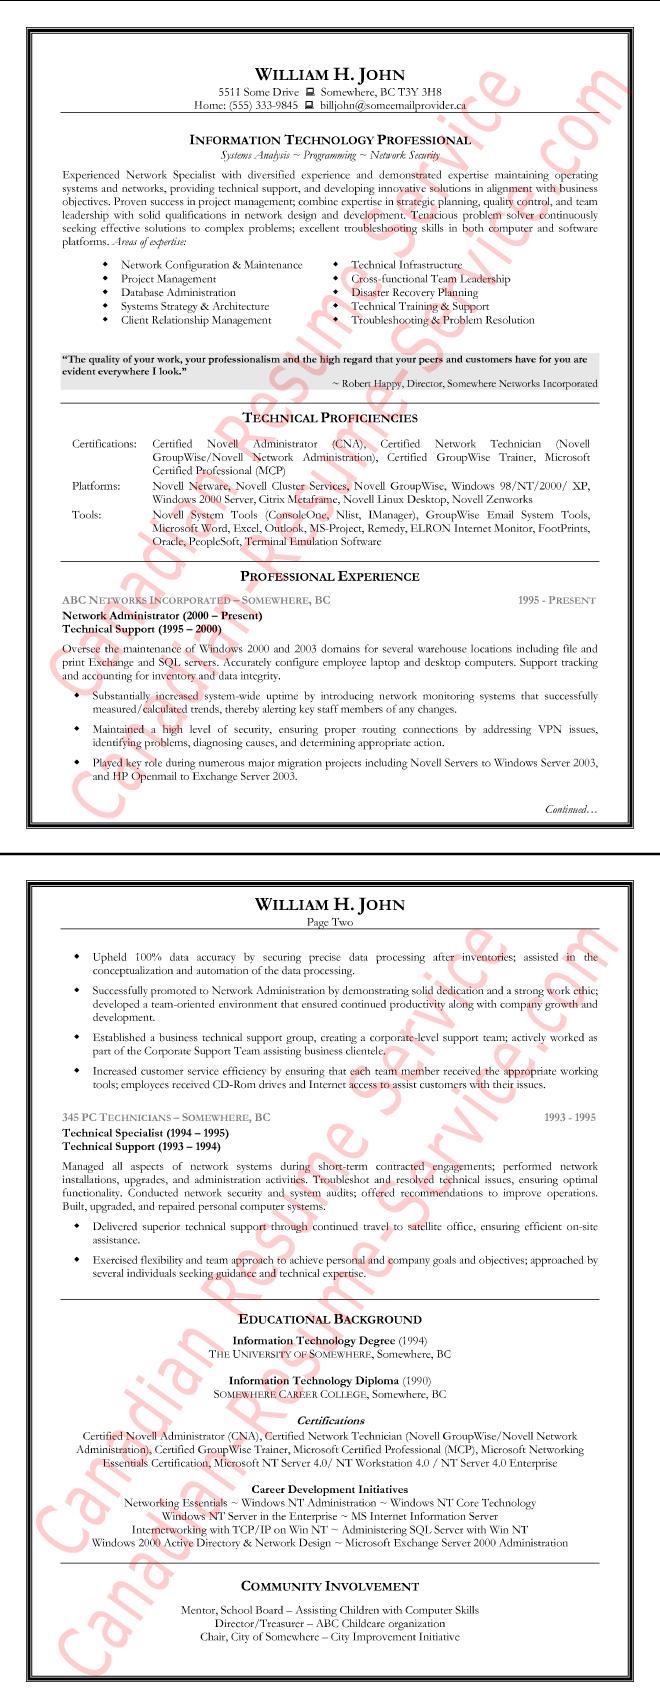 resume keywords for information technology